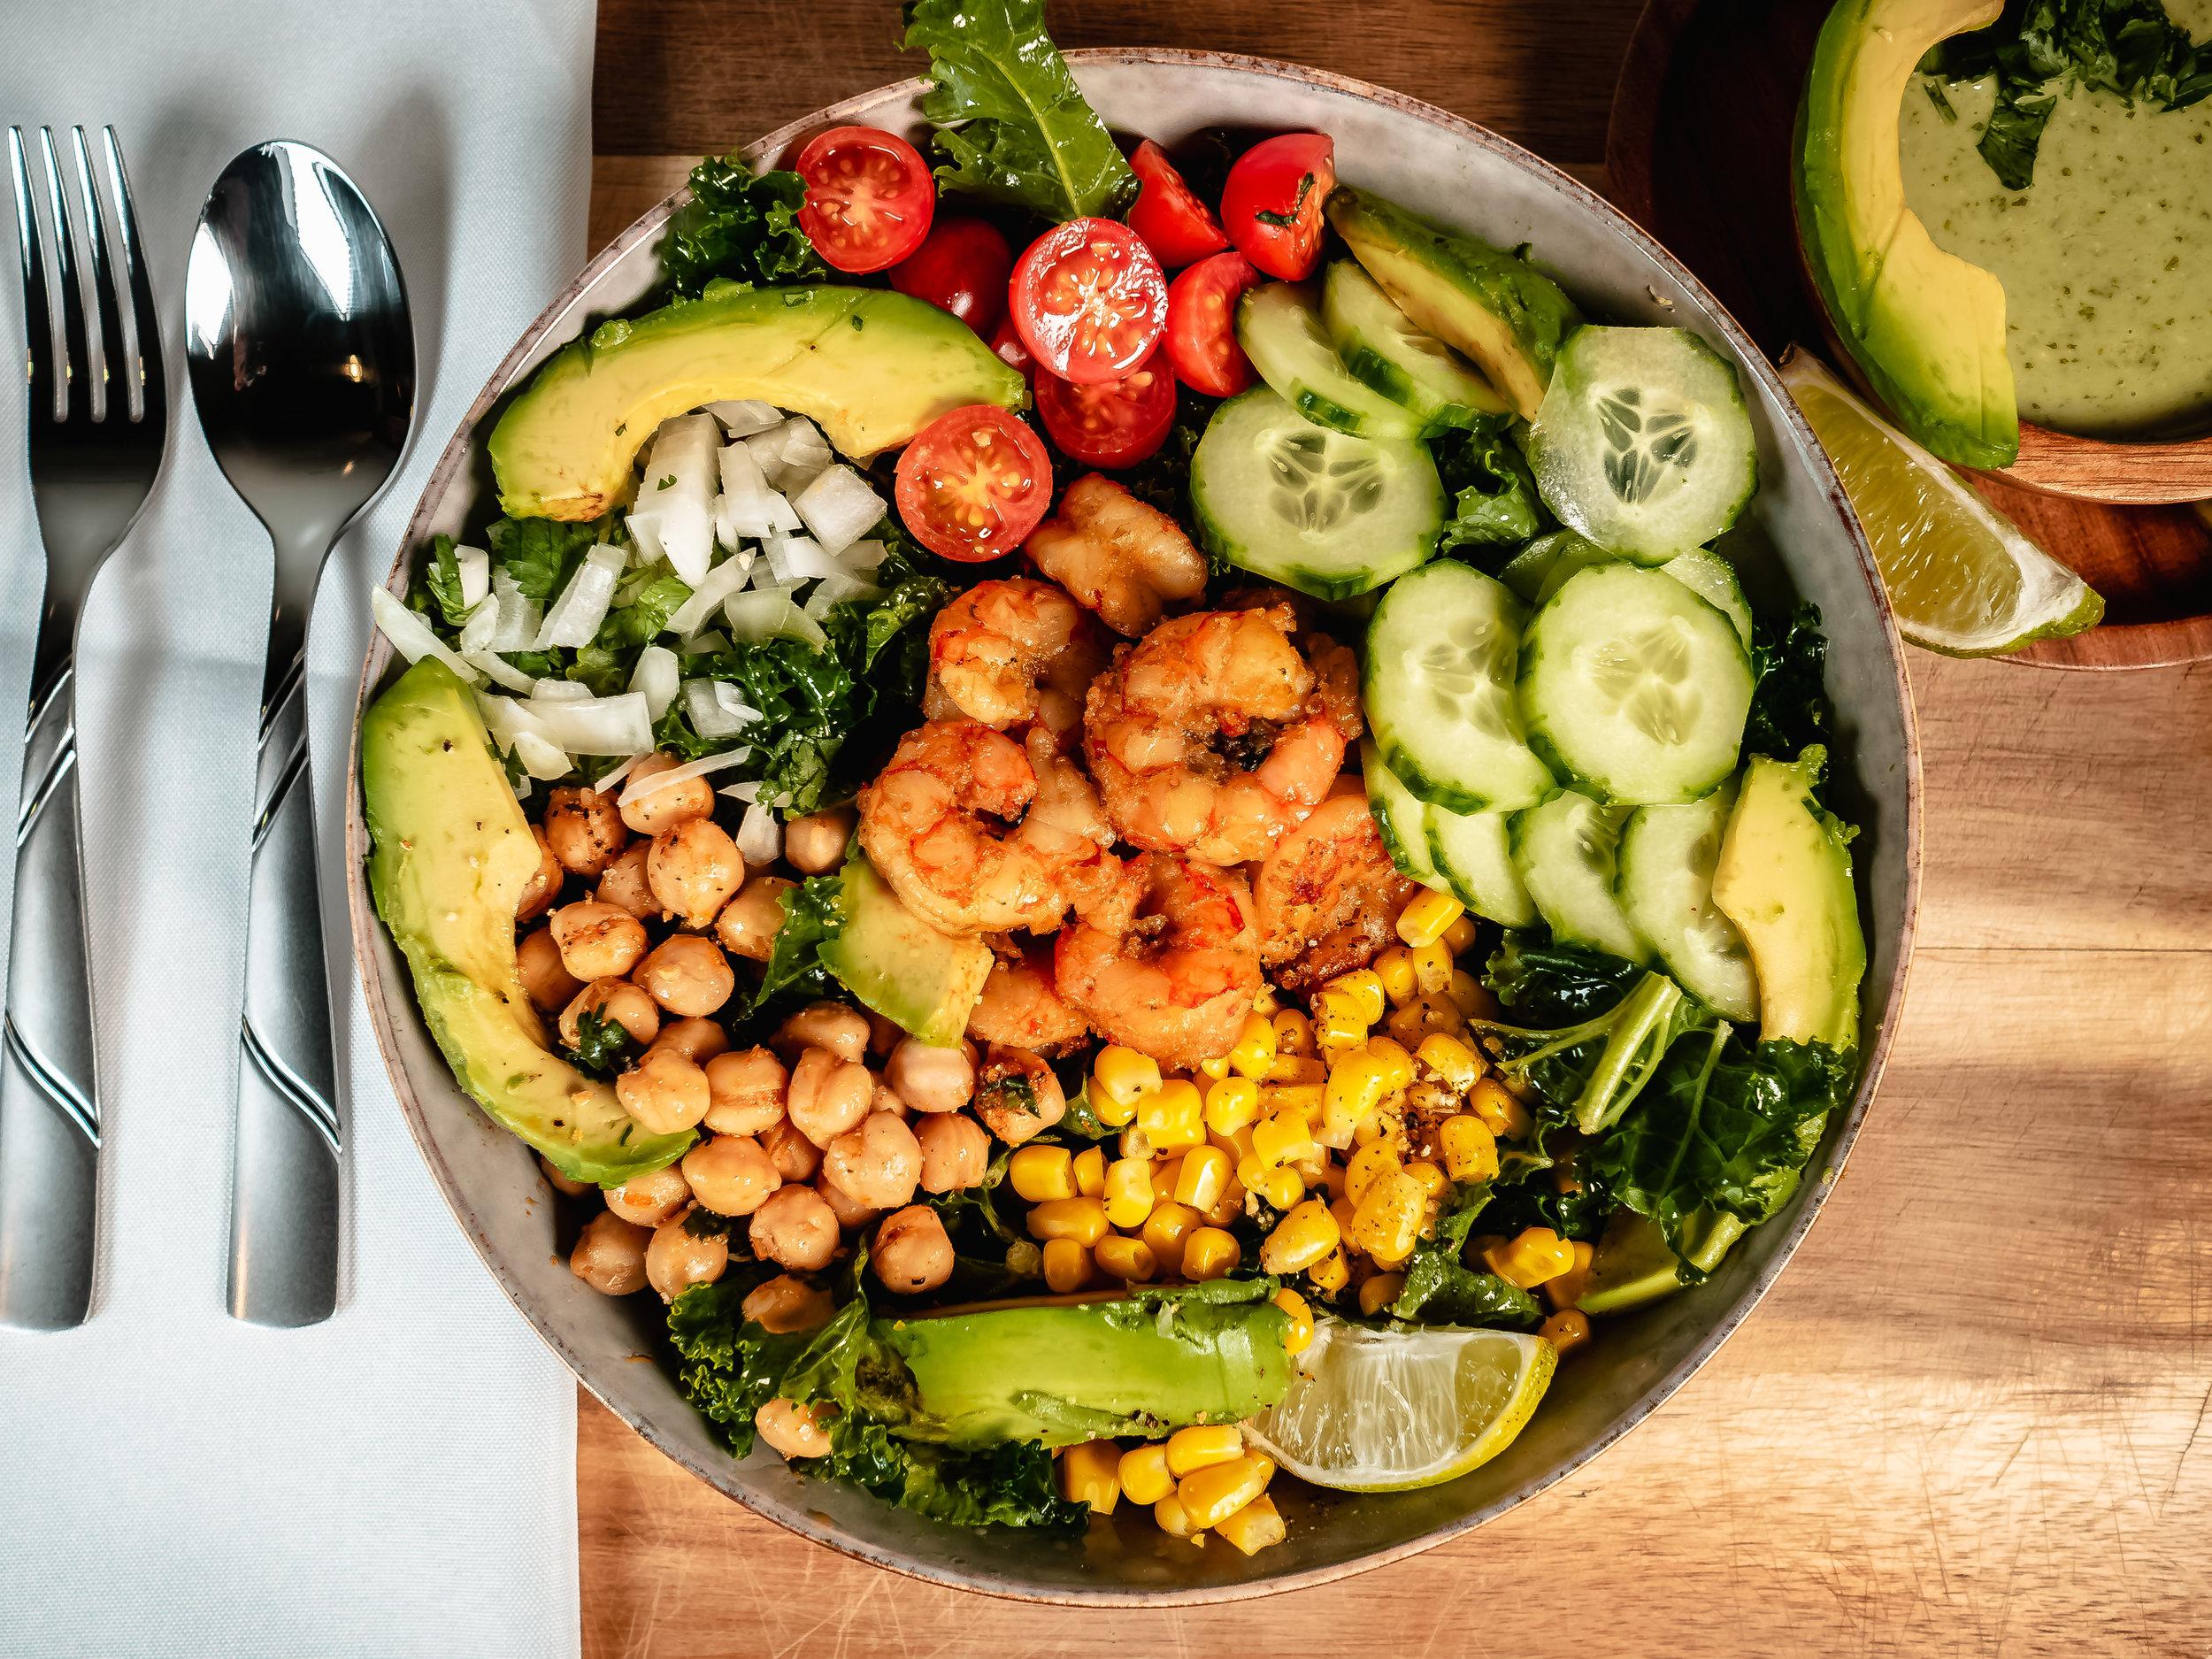 Shrimp Salad - A Great Easy Healthy Option